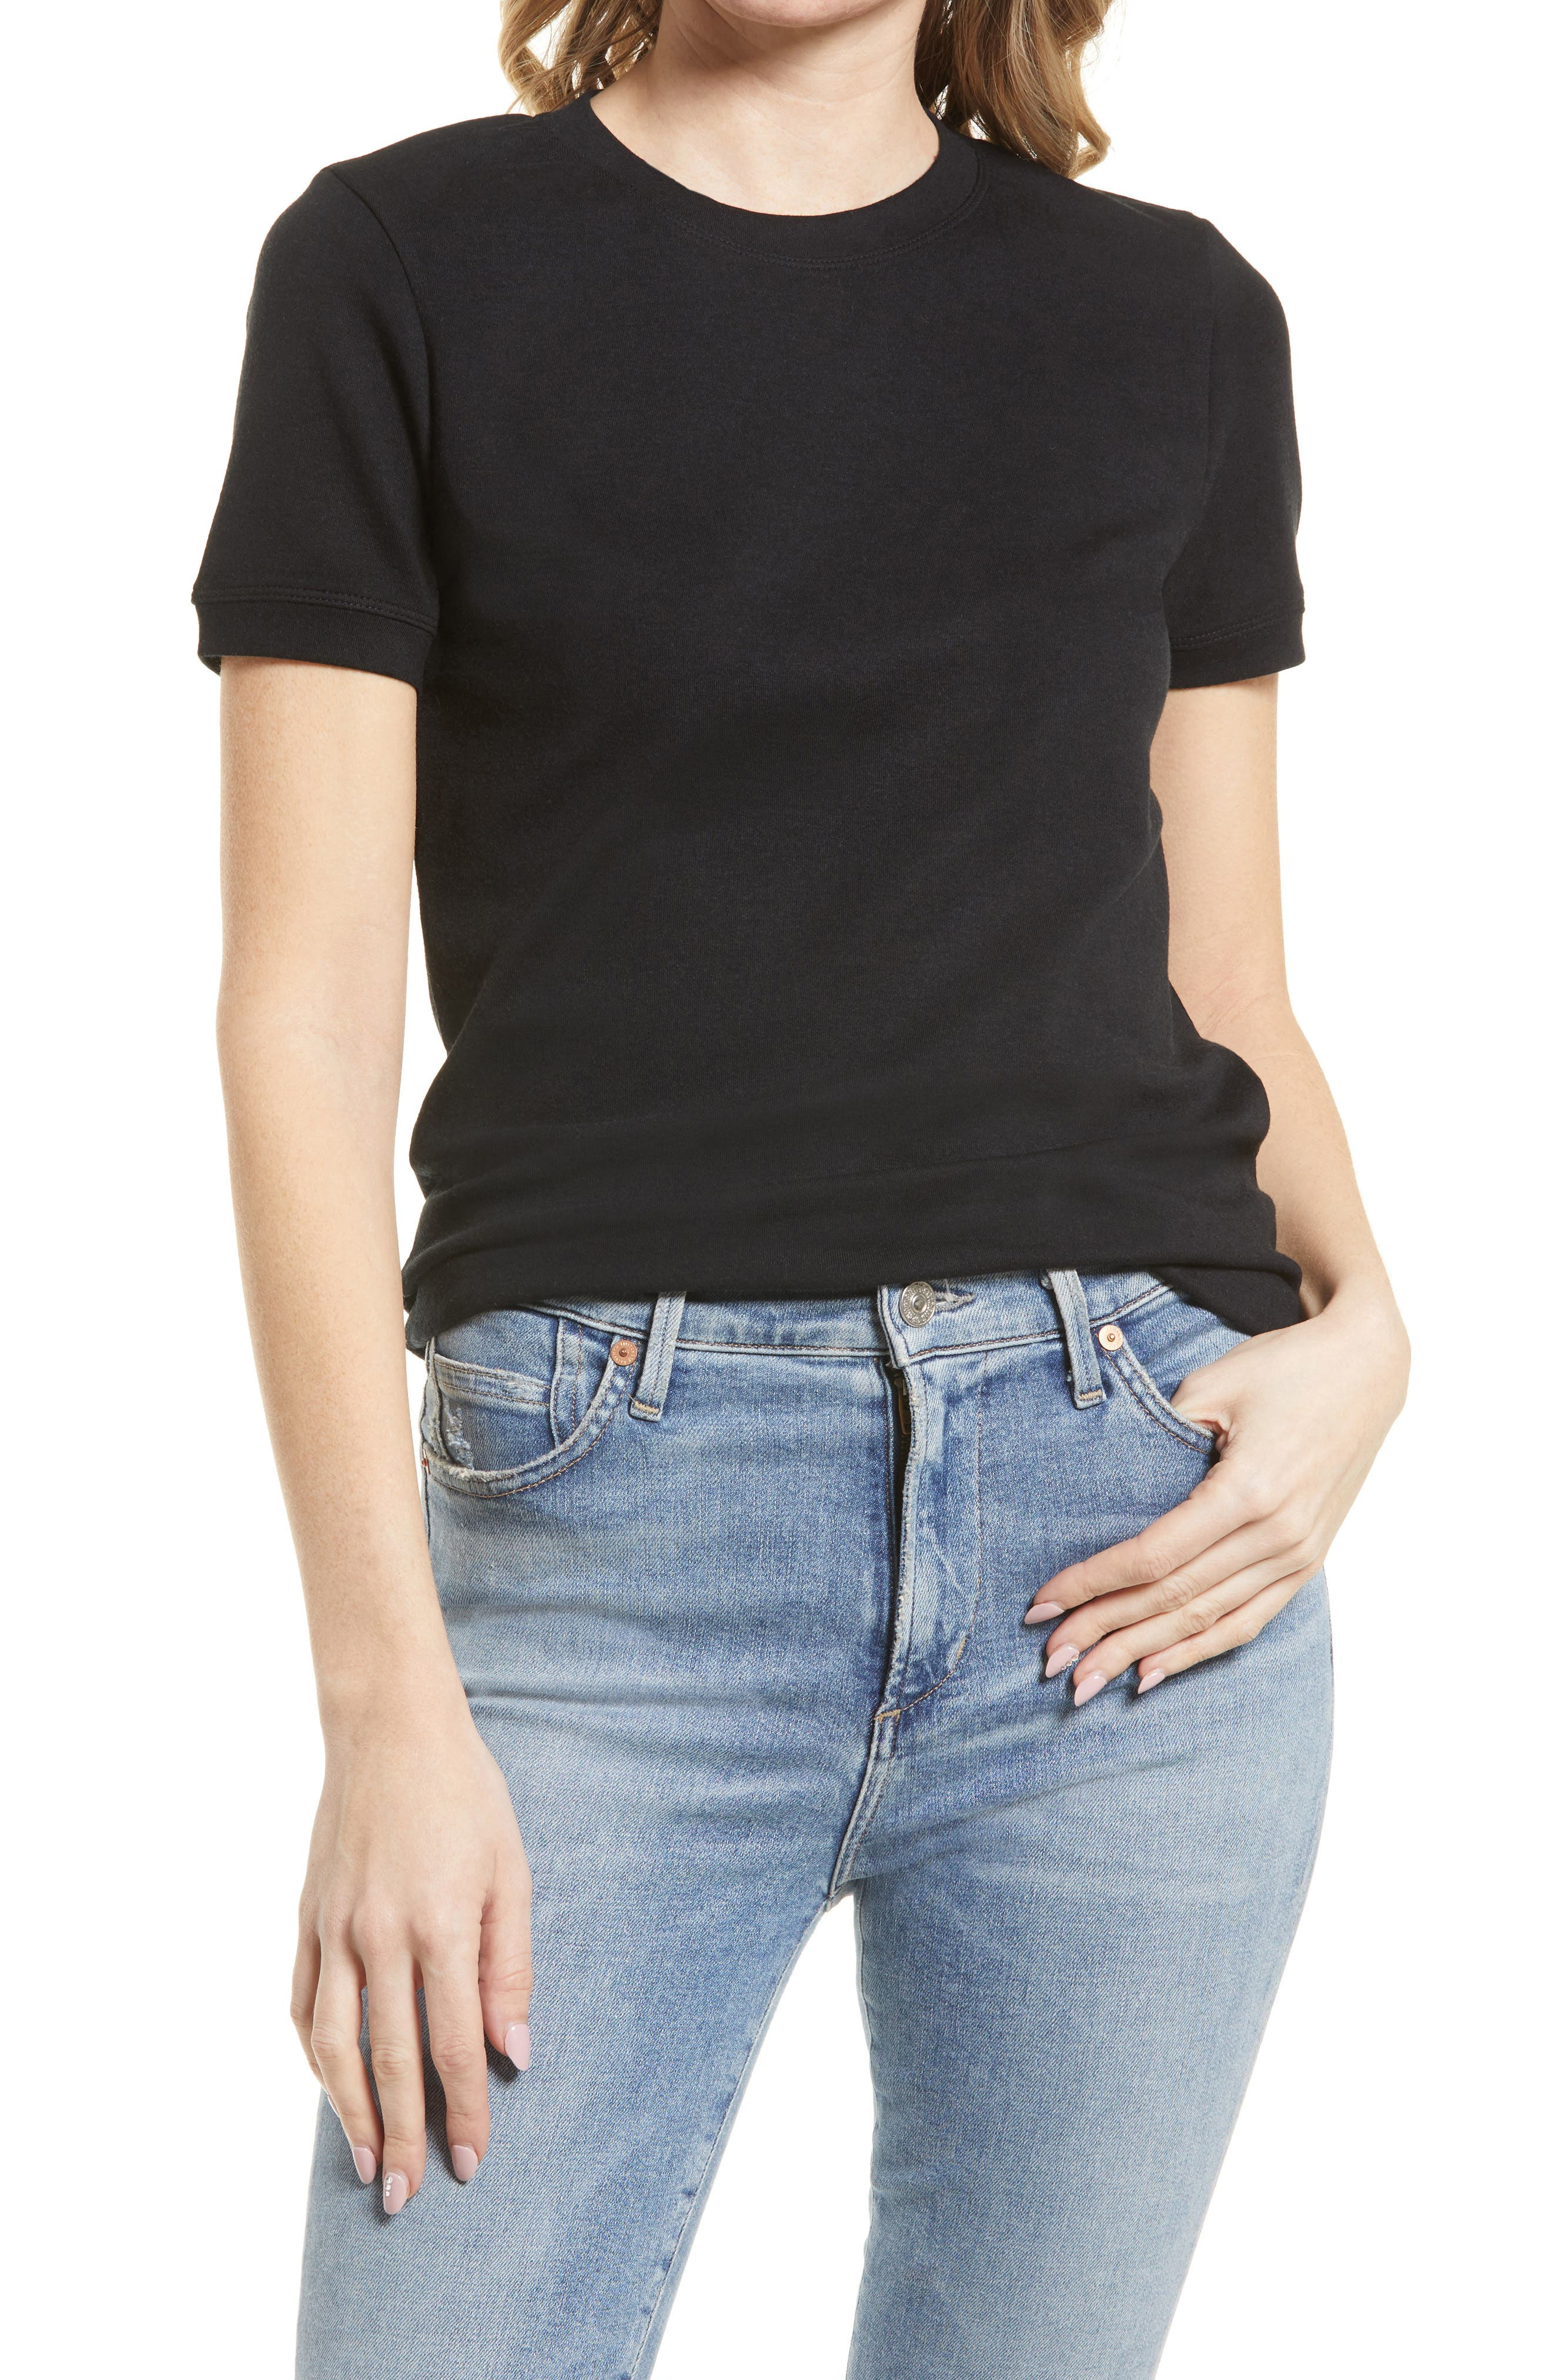 50s Shirts & Tops Womens Treasure  Bond Tonal Ringer T-Shirt Size X-Small - Black $29.00 AT vintagedancer.com